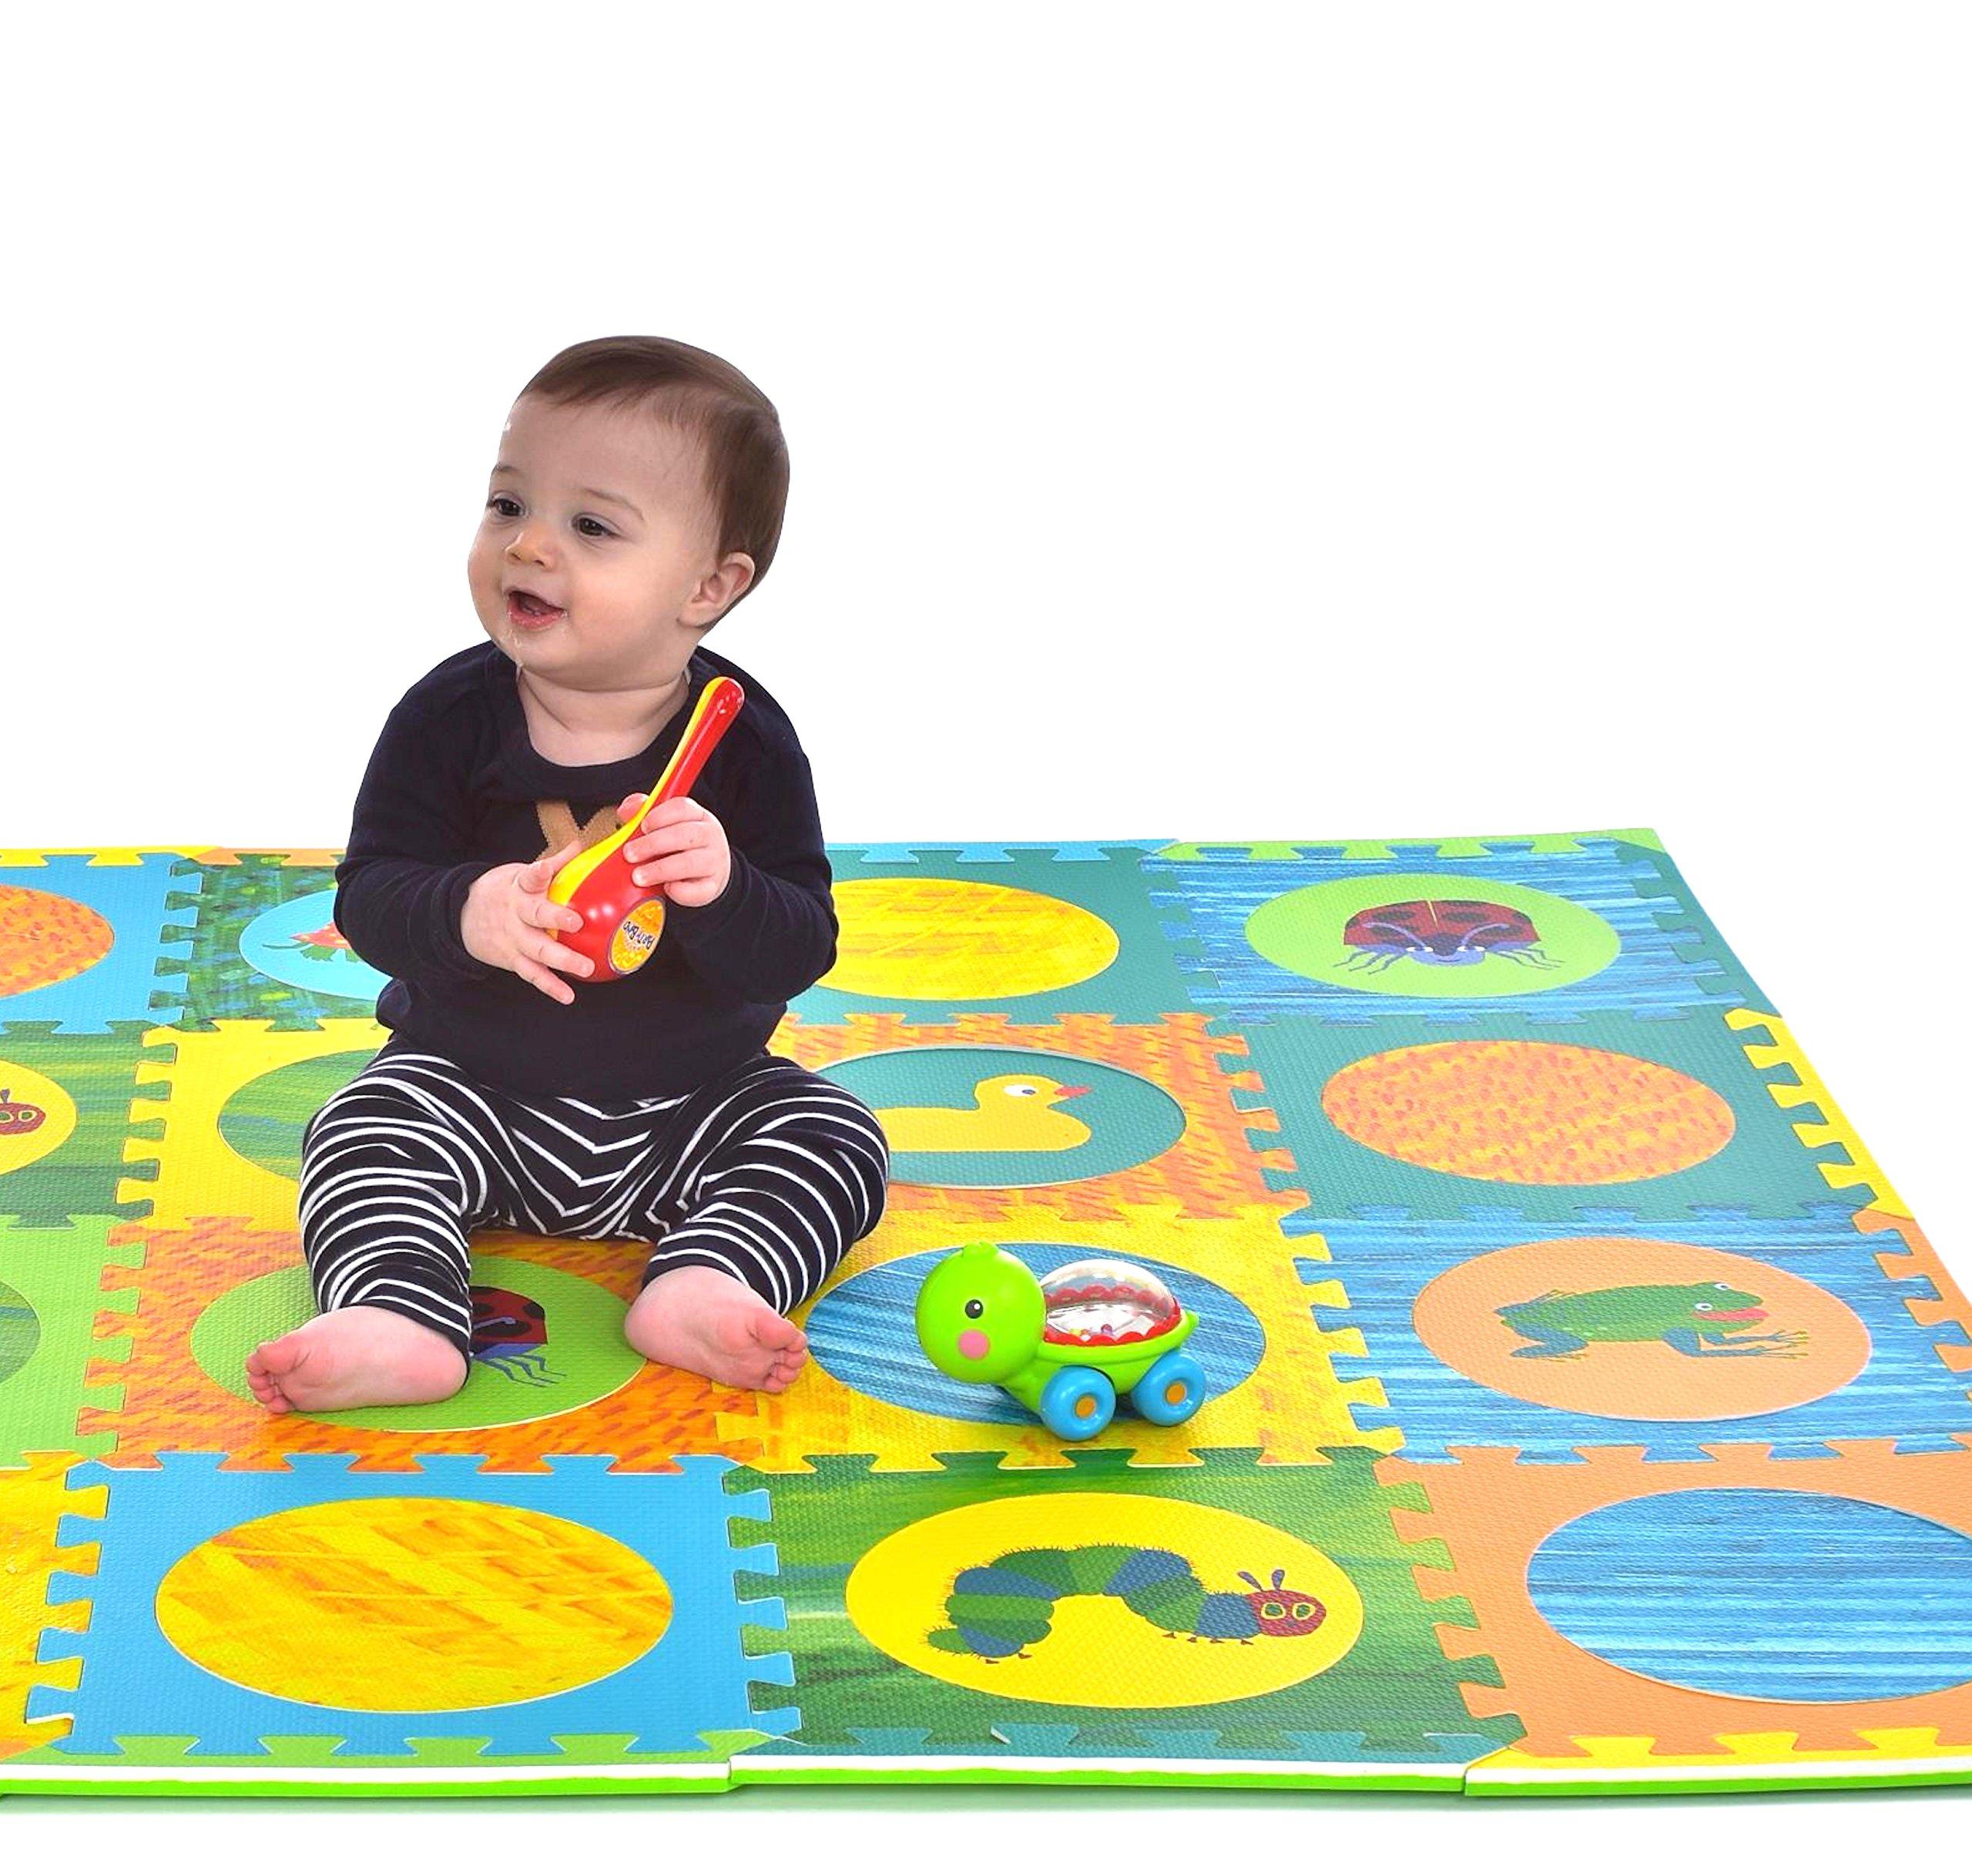 hungry caterpillar baby mat puzzle mat baby play mat foam mat 20 foam floor 875376008451 ebay. Black Bedroom Furniture Sets. Home Design Ideas